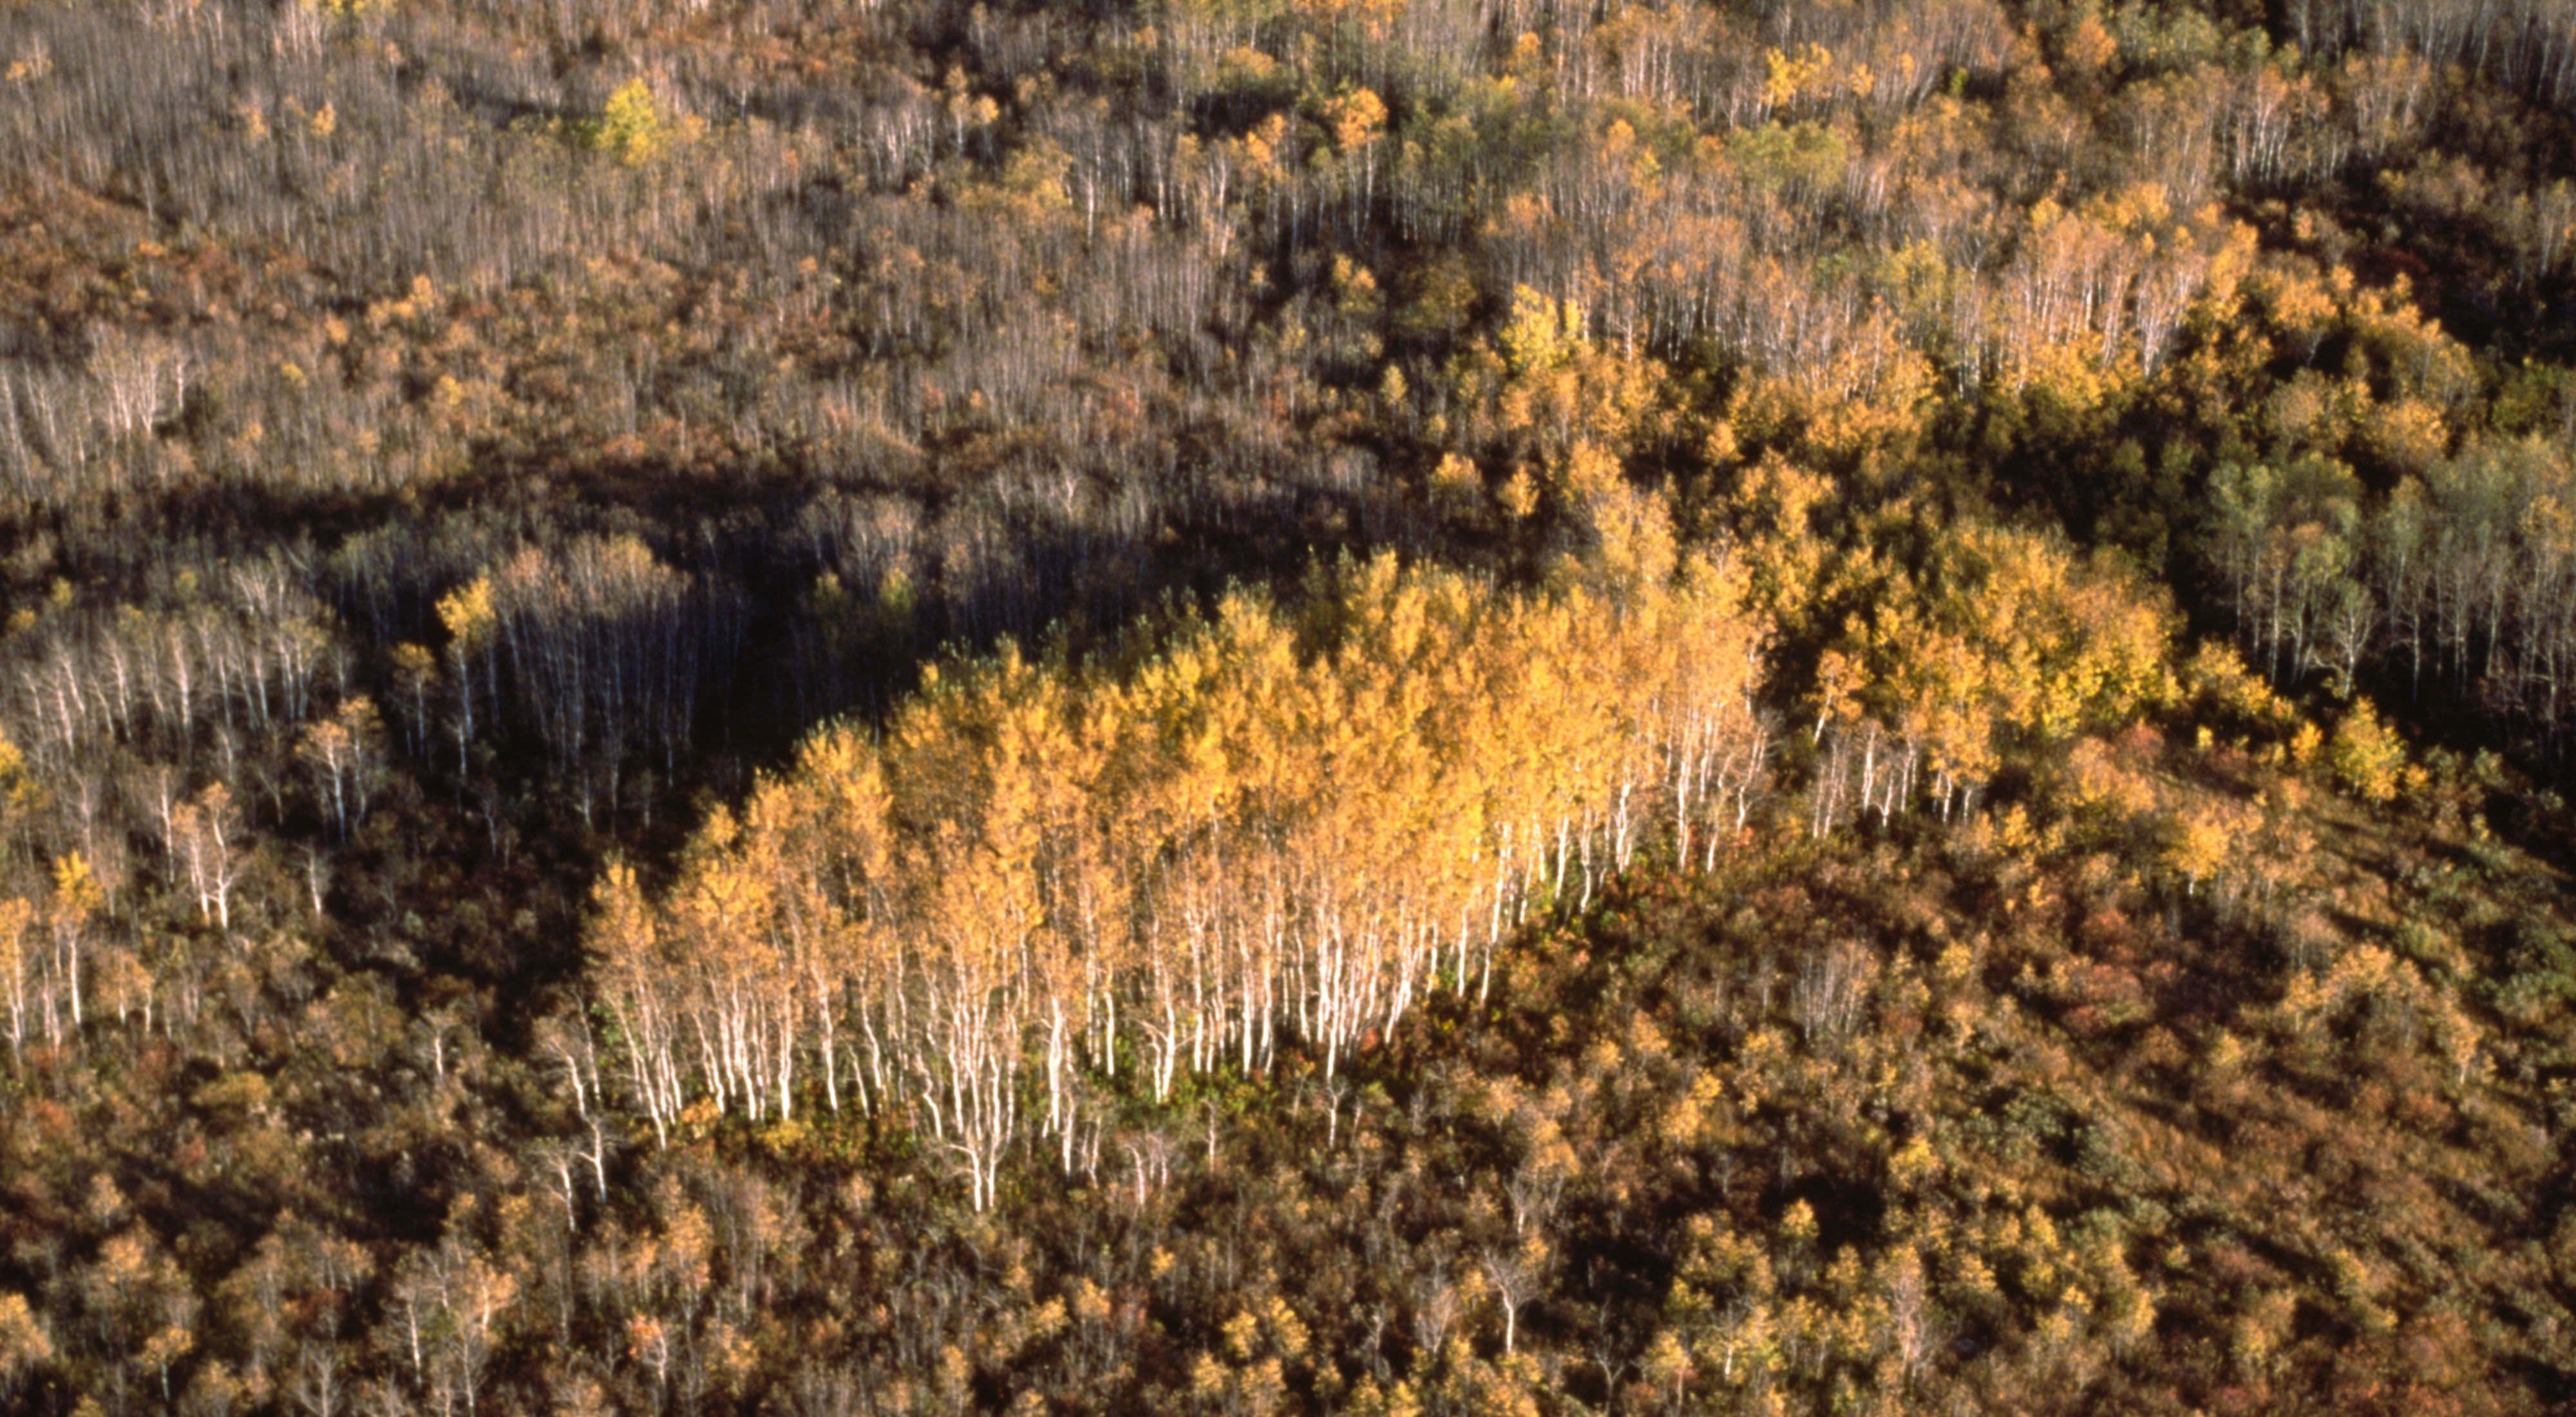 Tallgrass Aspen Parkland